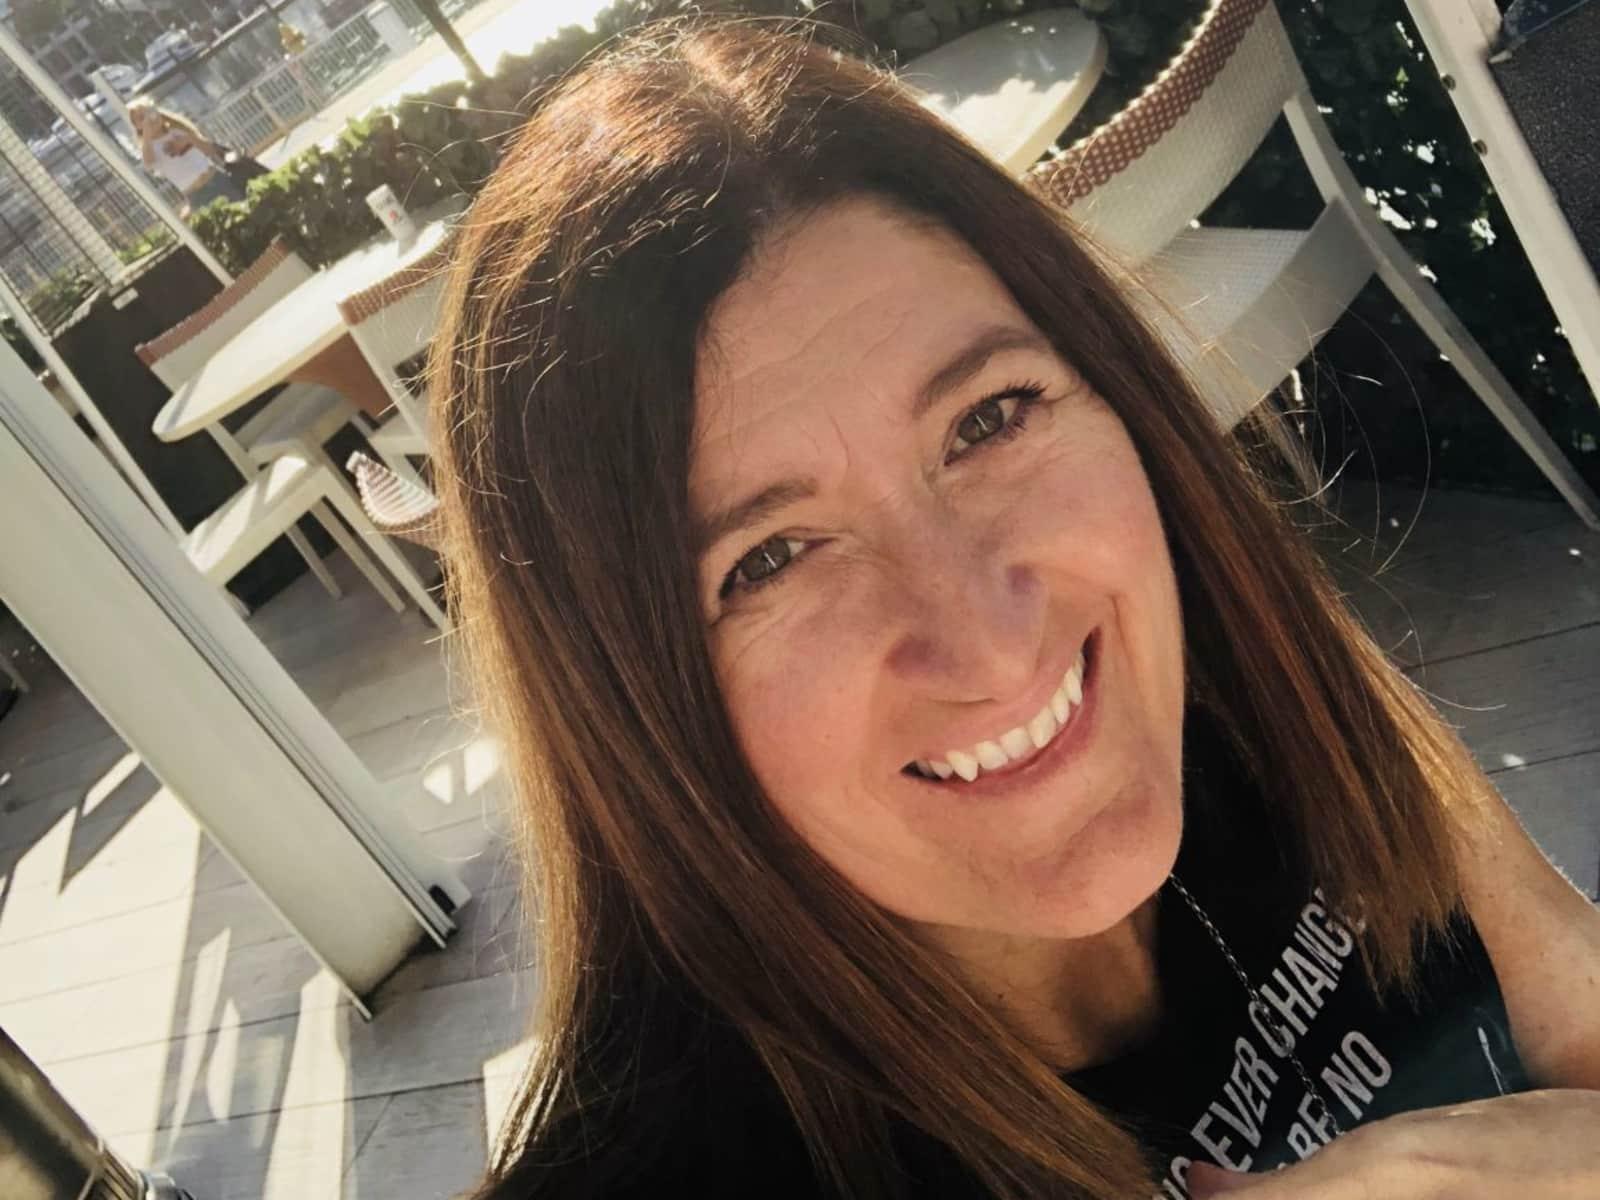 Manuela from Sydney, New South Wales, Australia